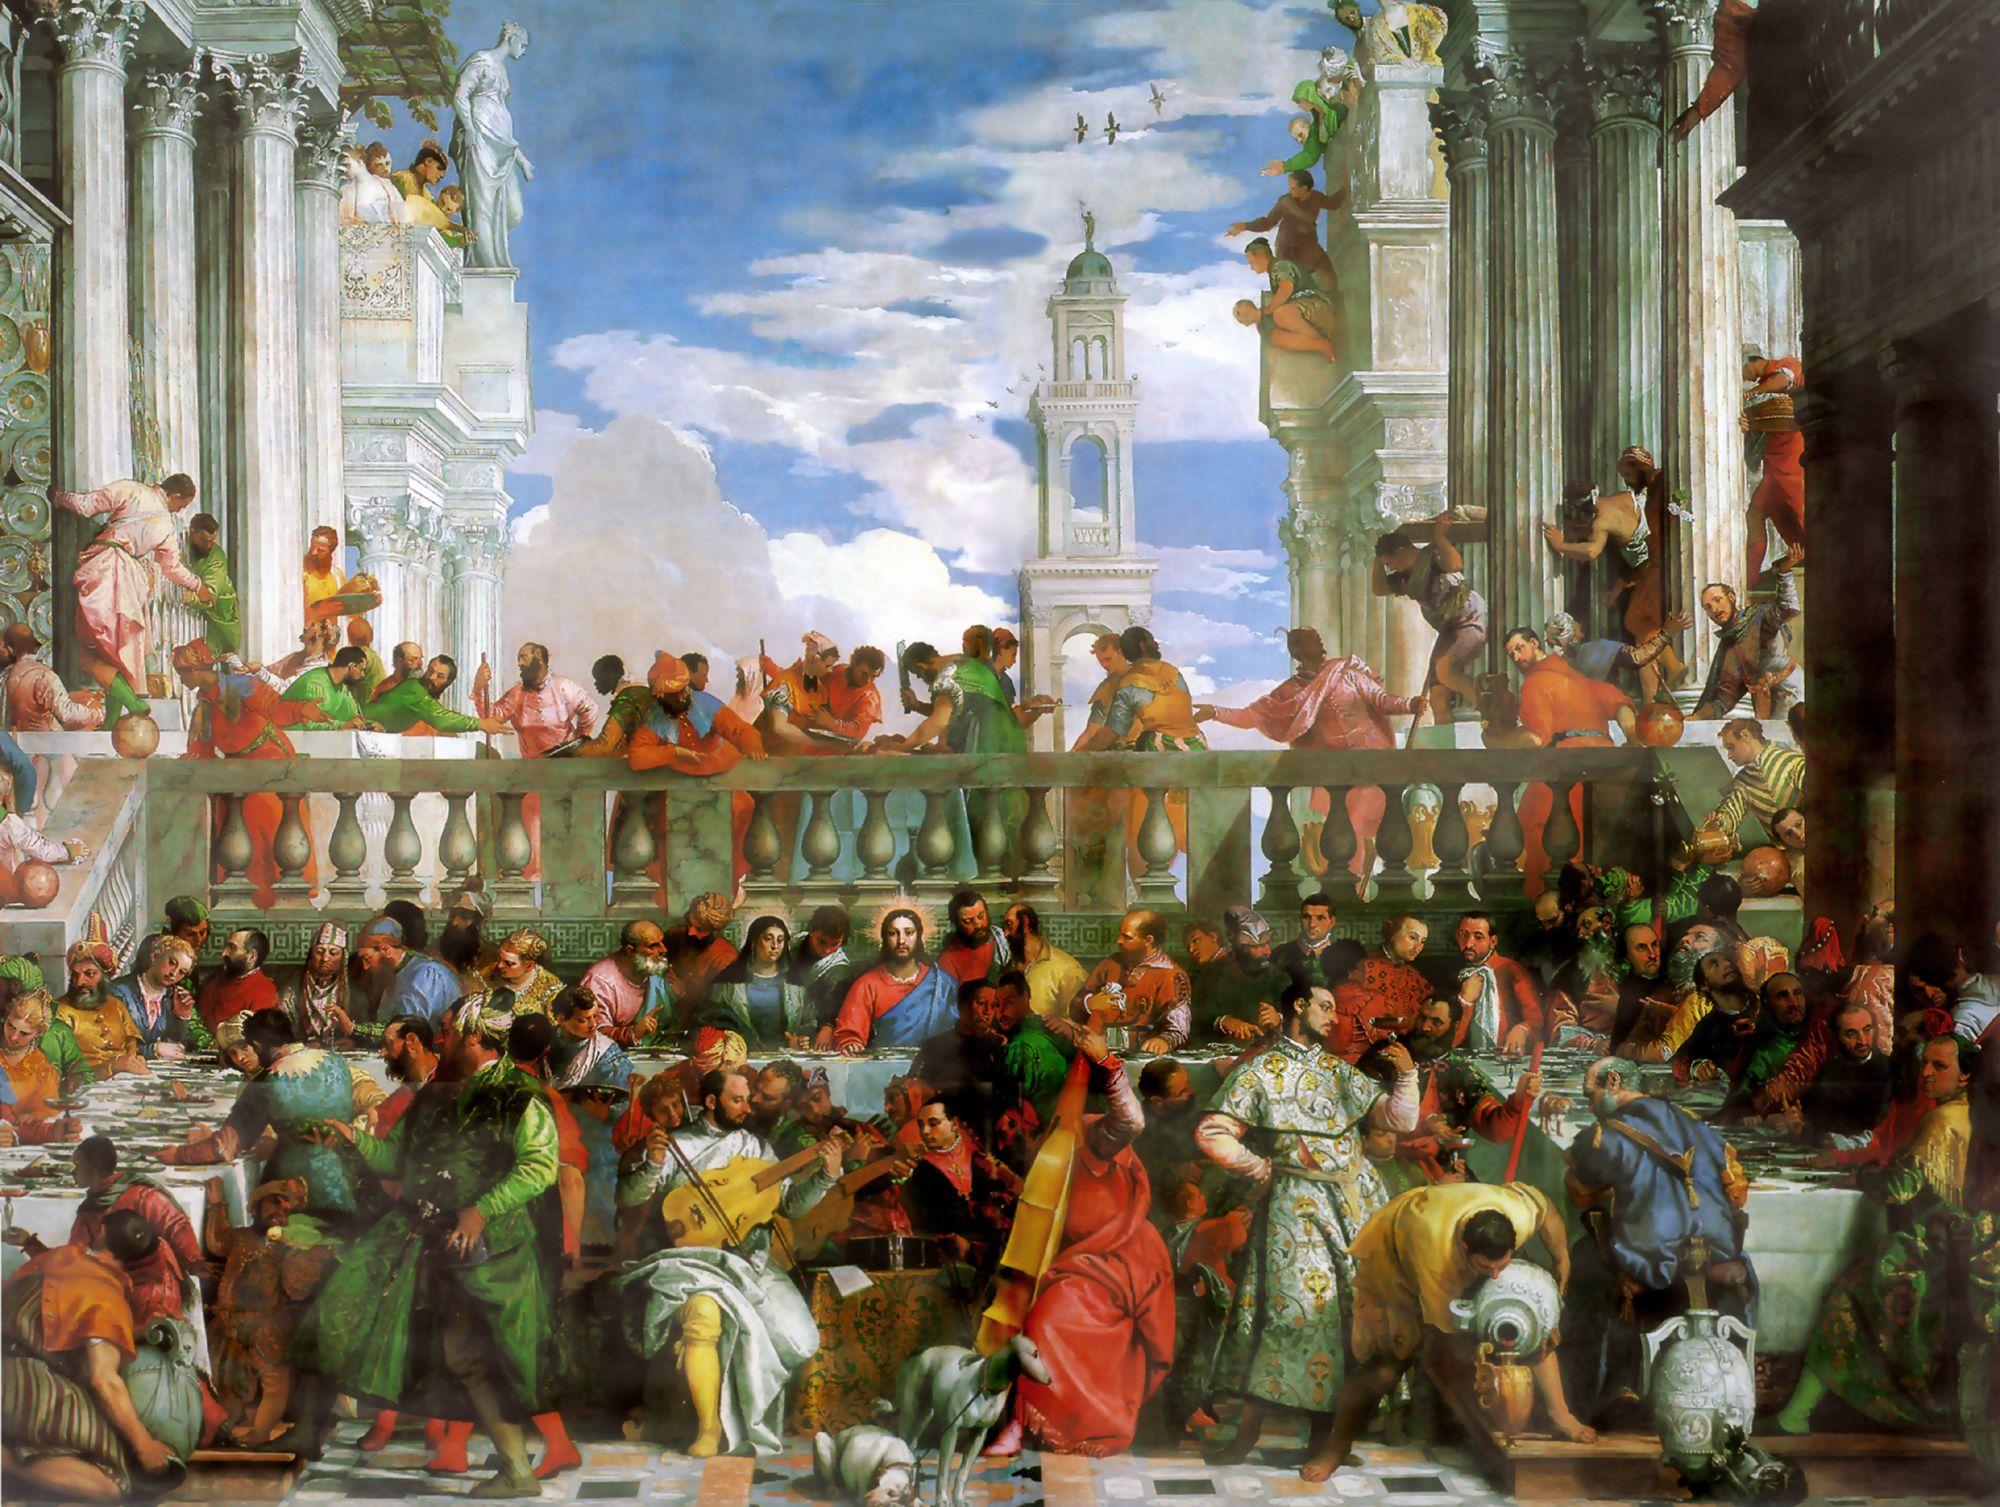 Veronese_Hochzeit zu Kana_Louvre